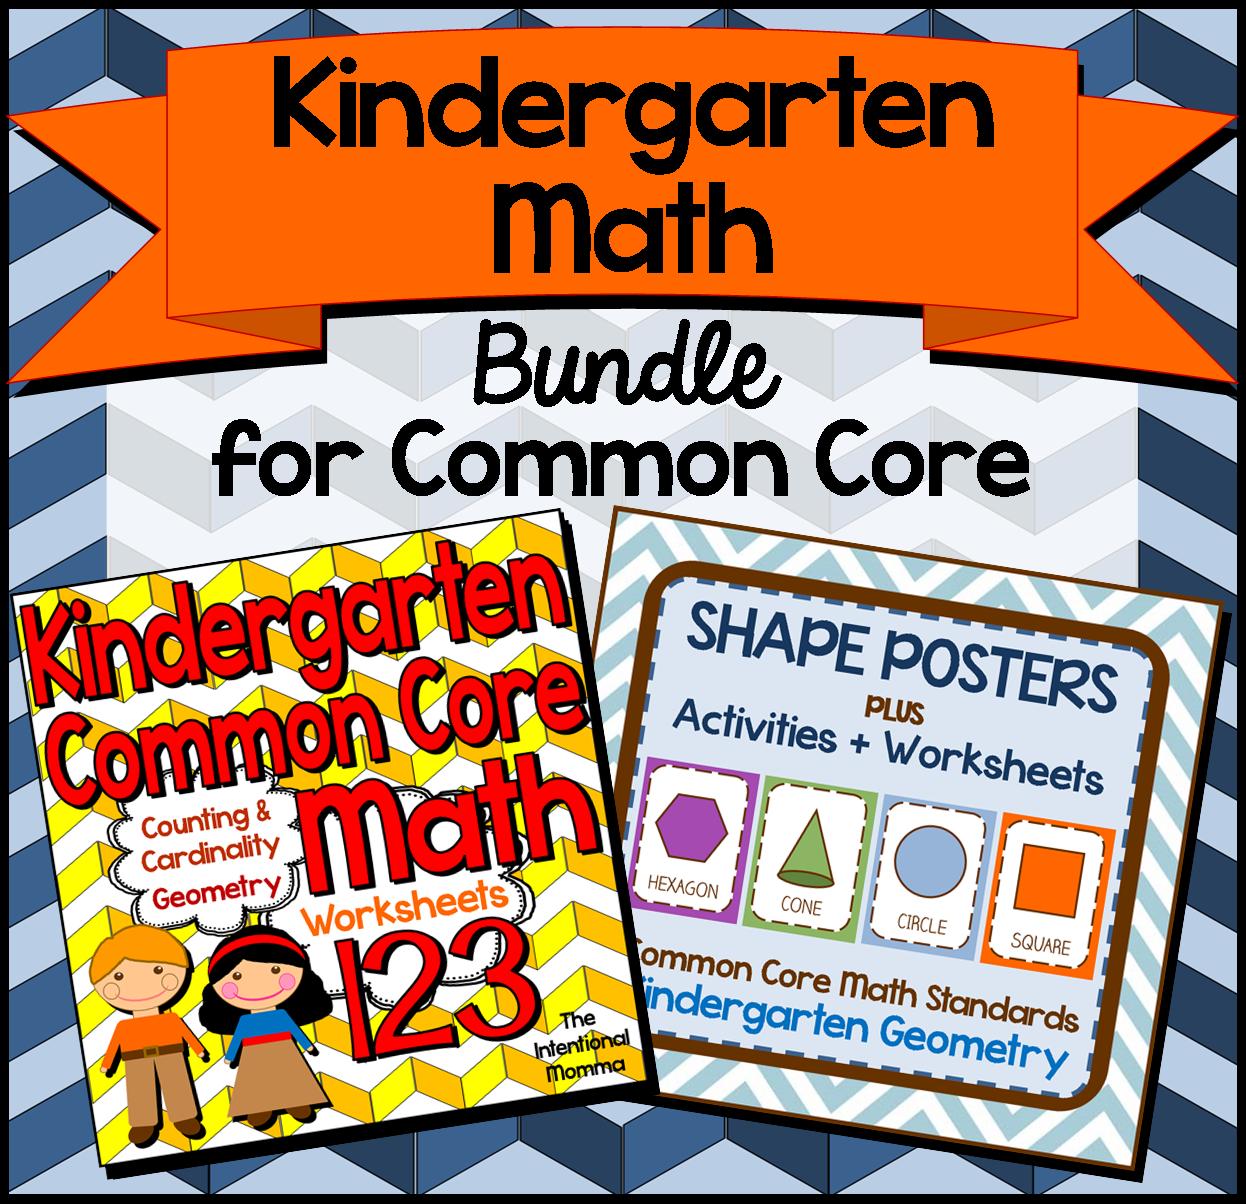 The Best Of Teacher Entrepreneurs Iii Bestselling Kindergarten Geometry Packs